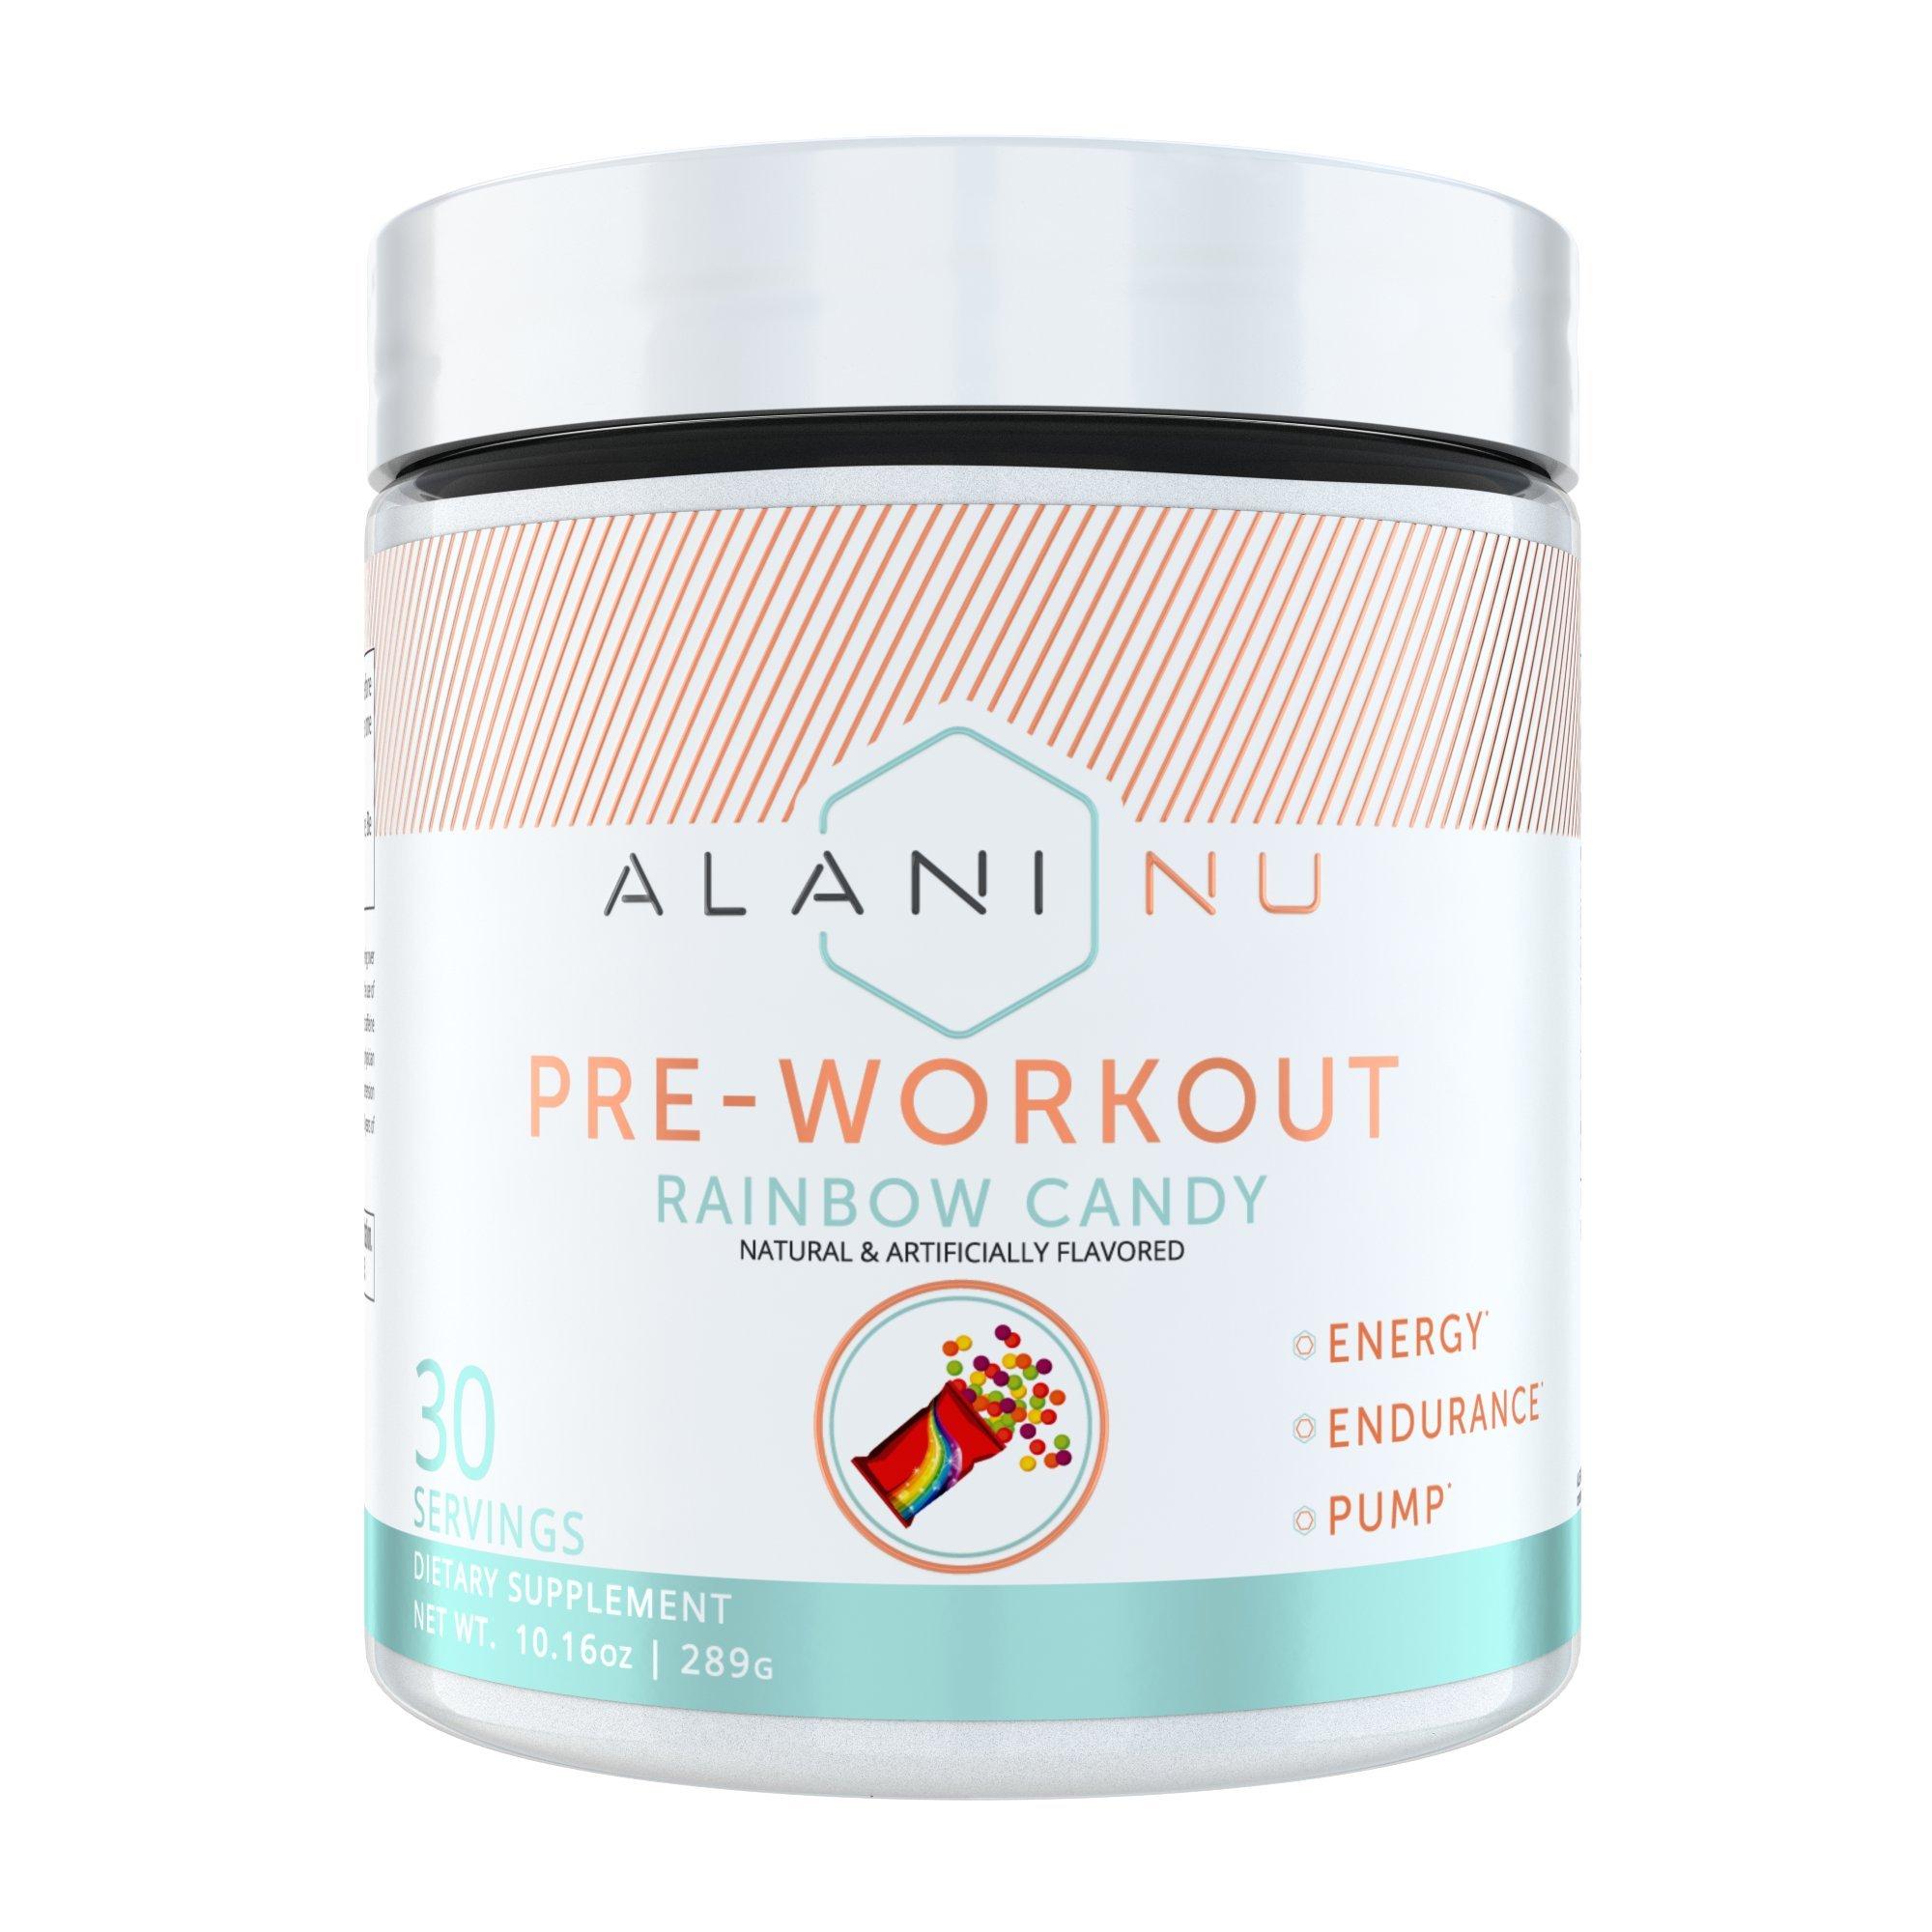 Alani Nu Pre-Workout - Rainbow Candy